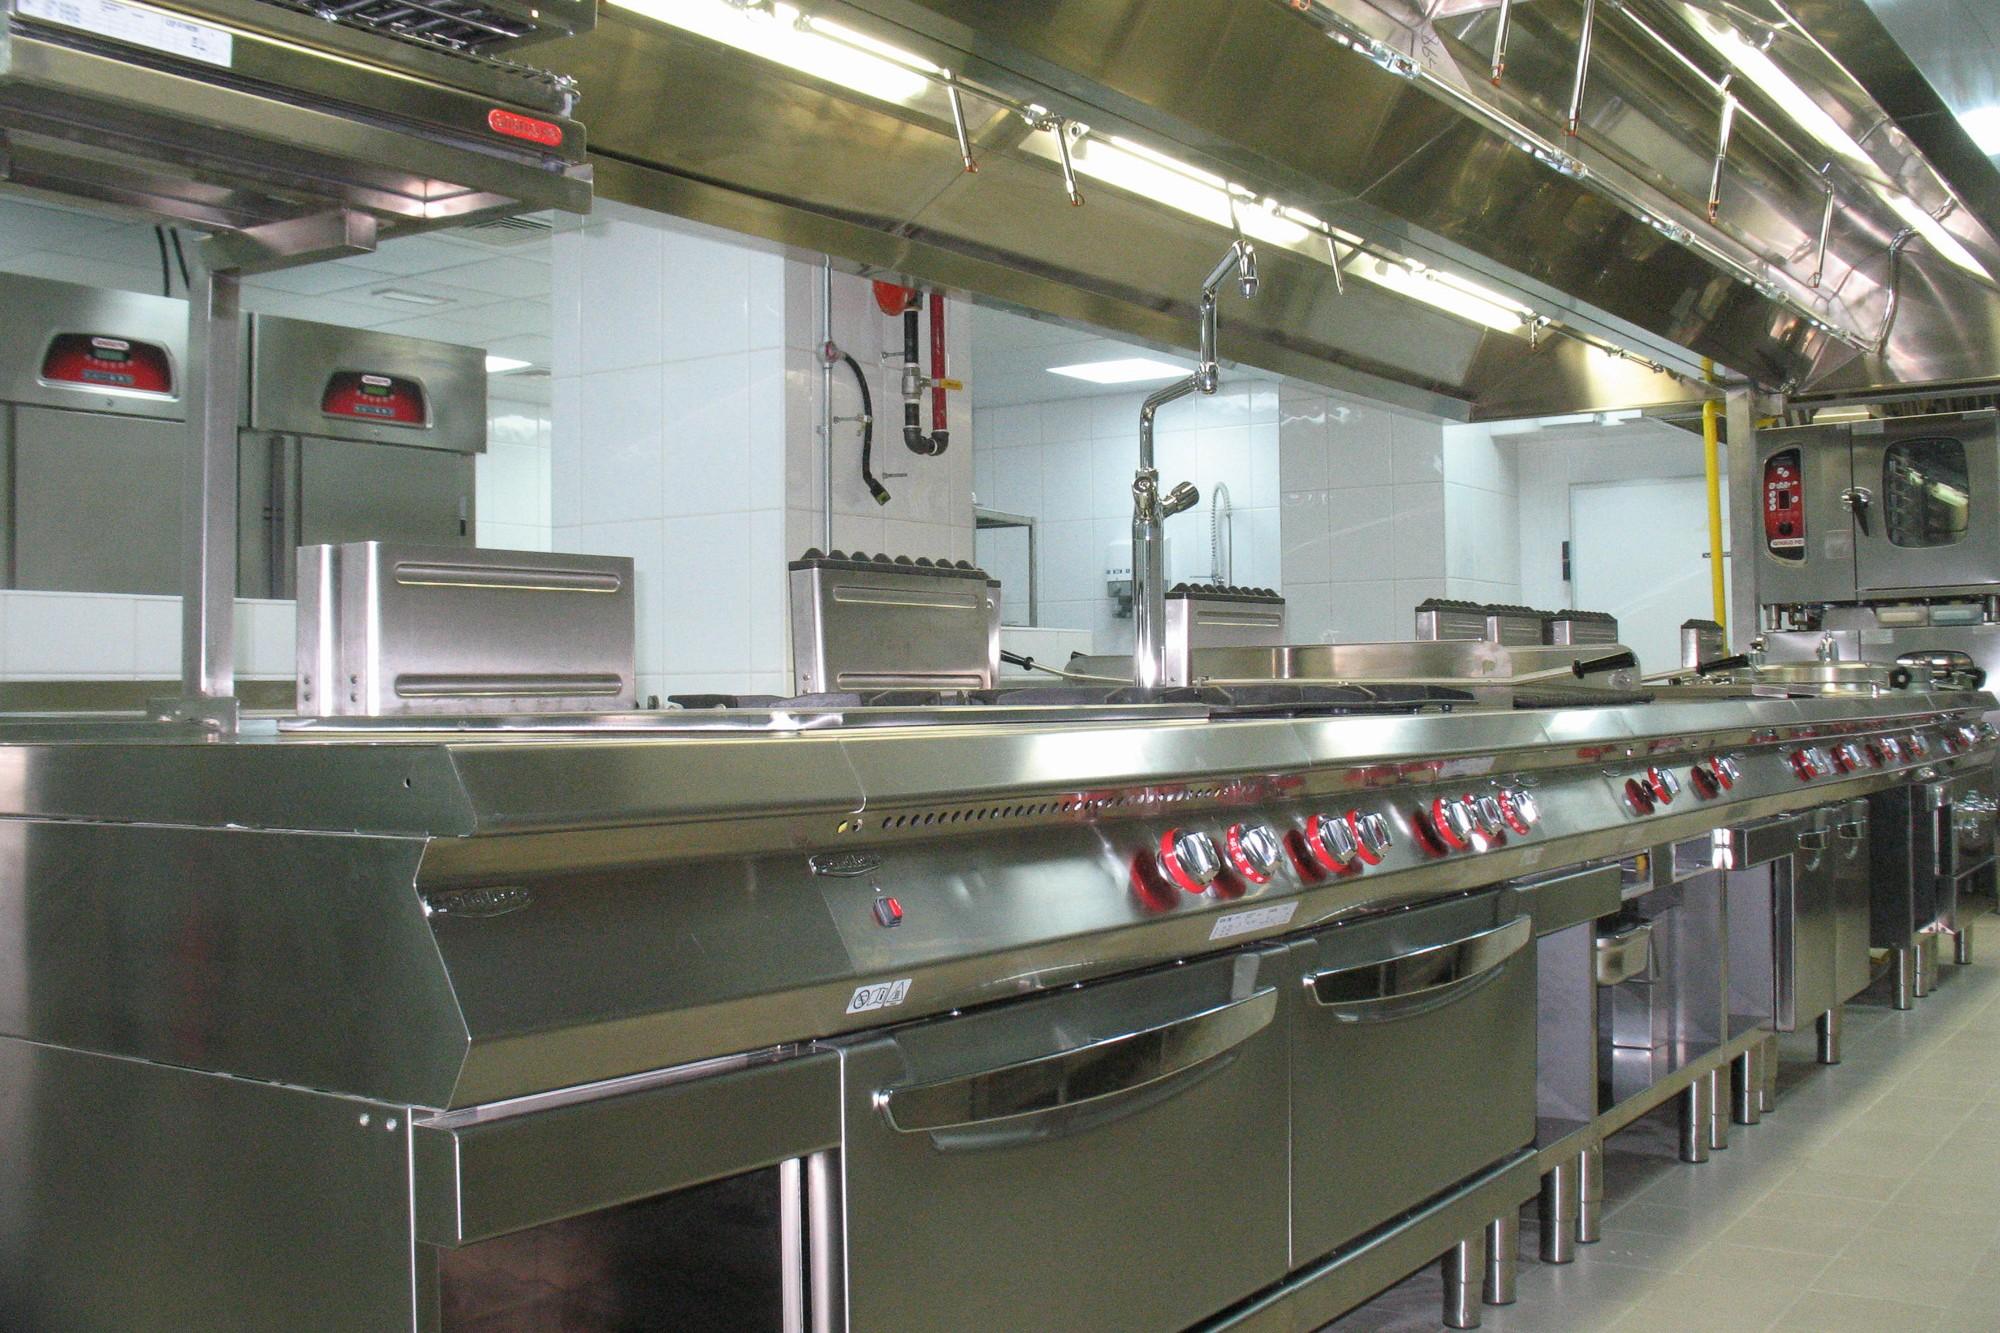 Italia_kitchen_-bice_b-1